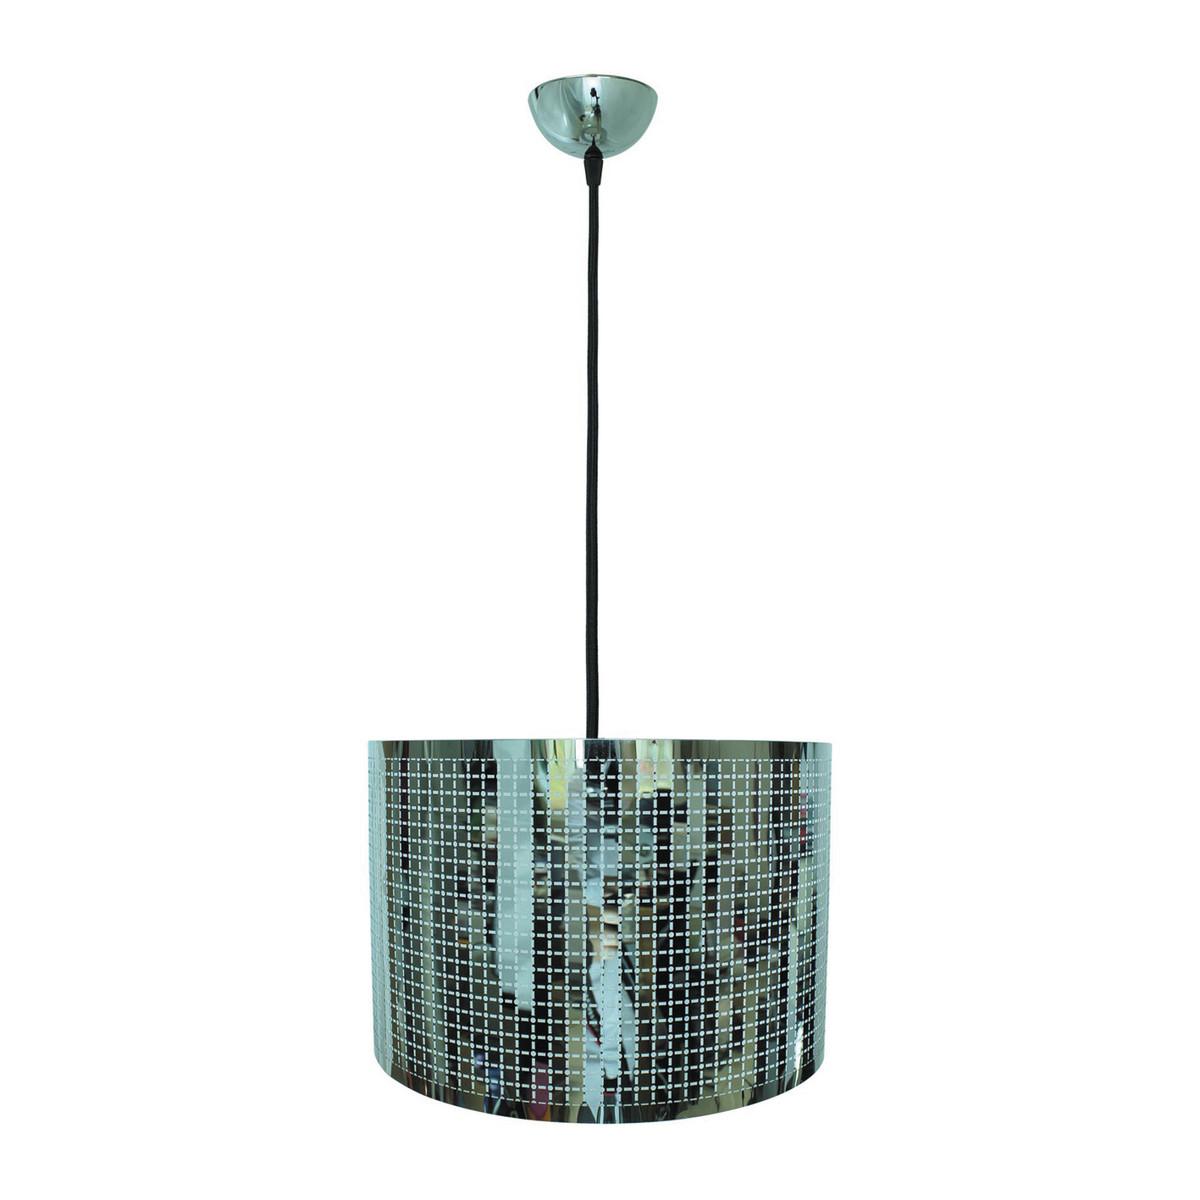 Lampadario moderno acciaio cromo lampada sospensione cucina ...